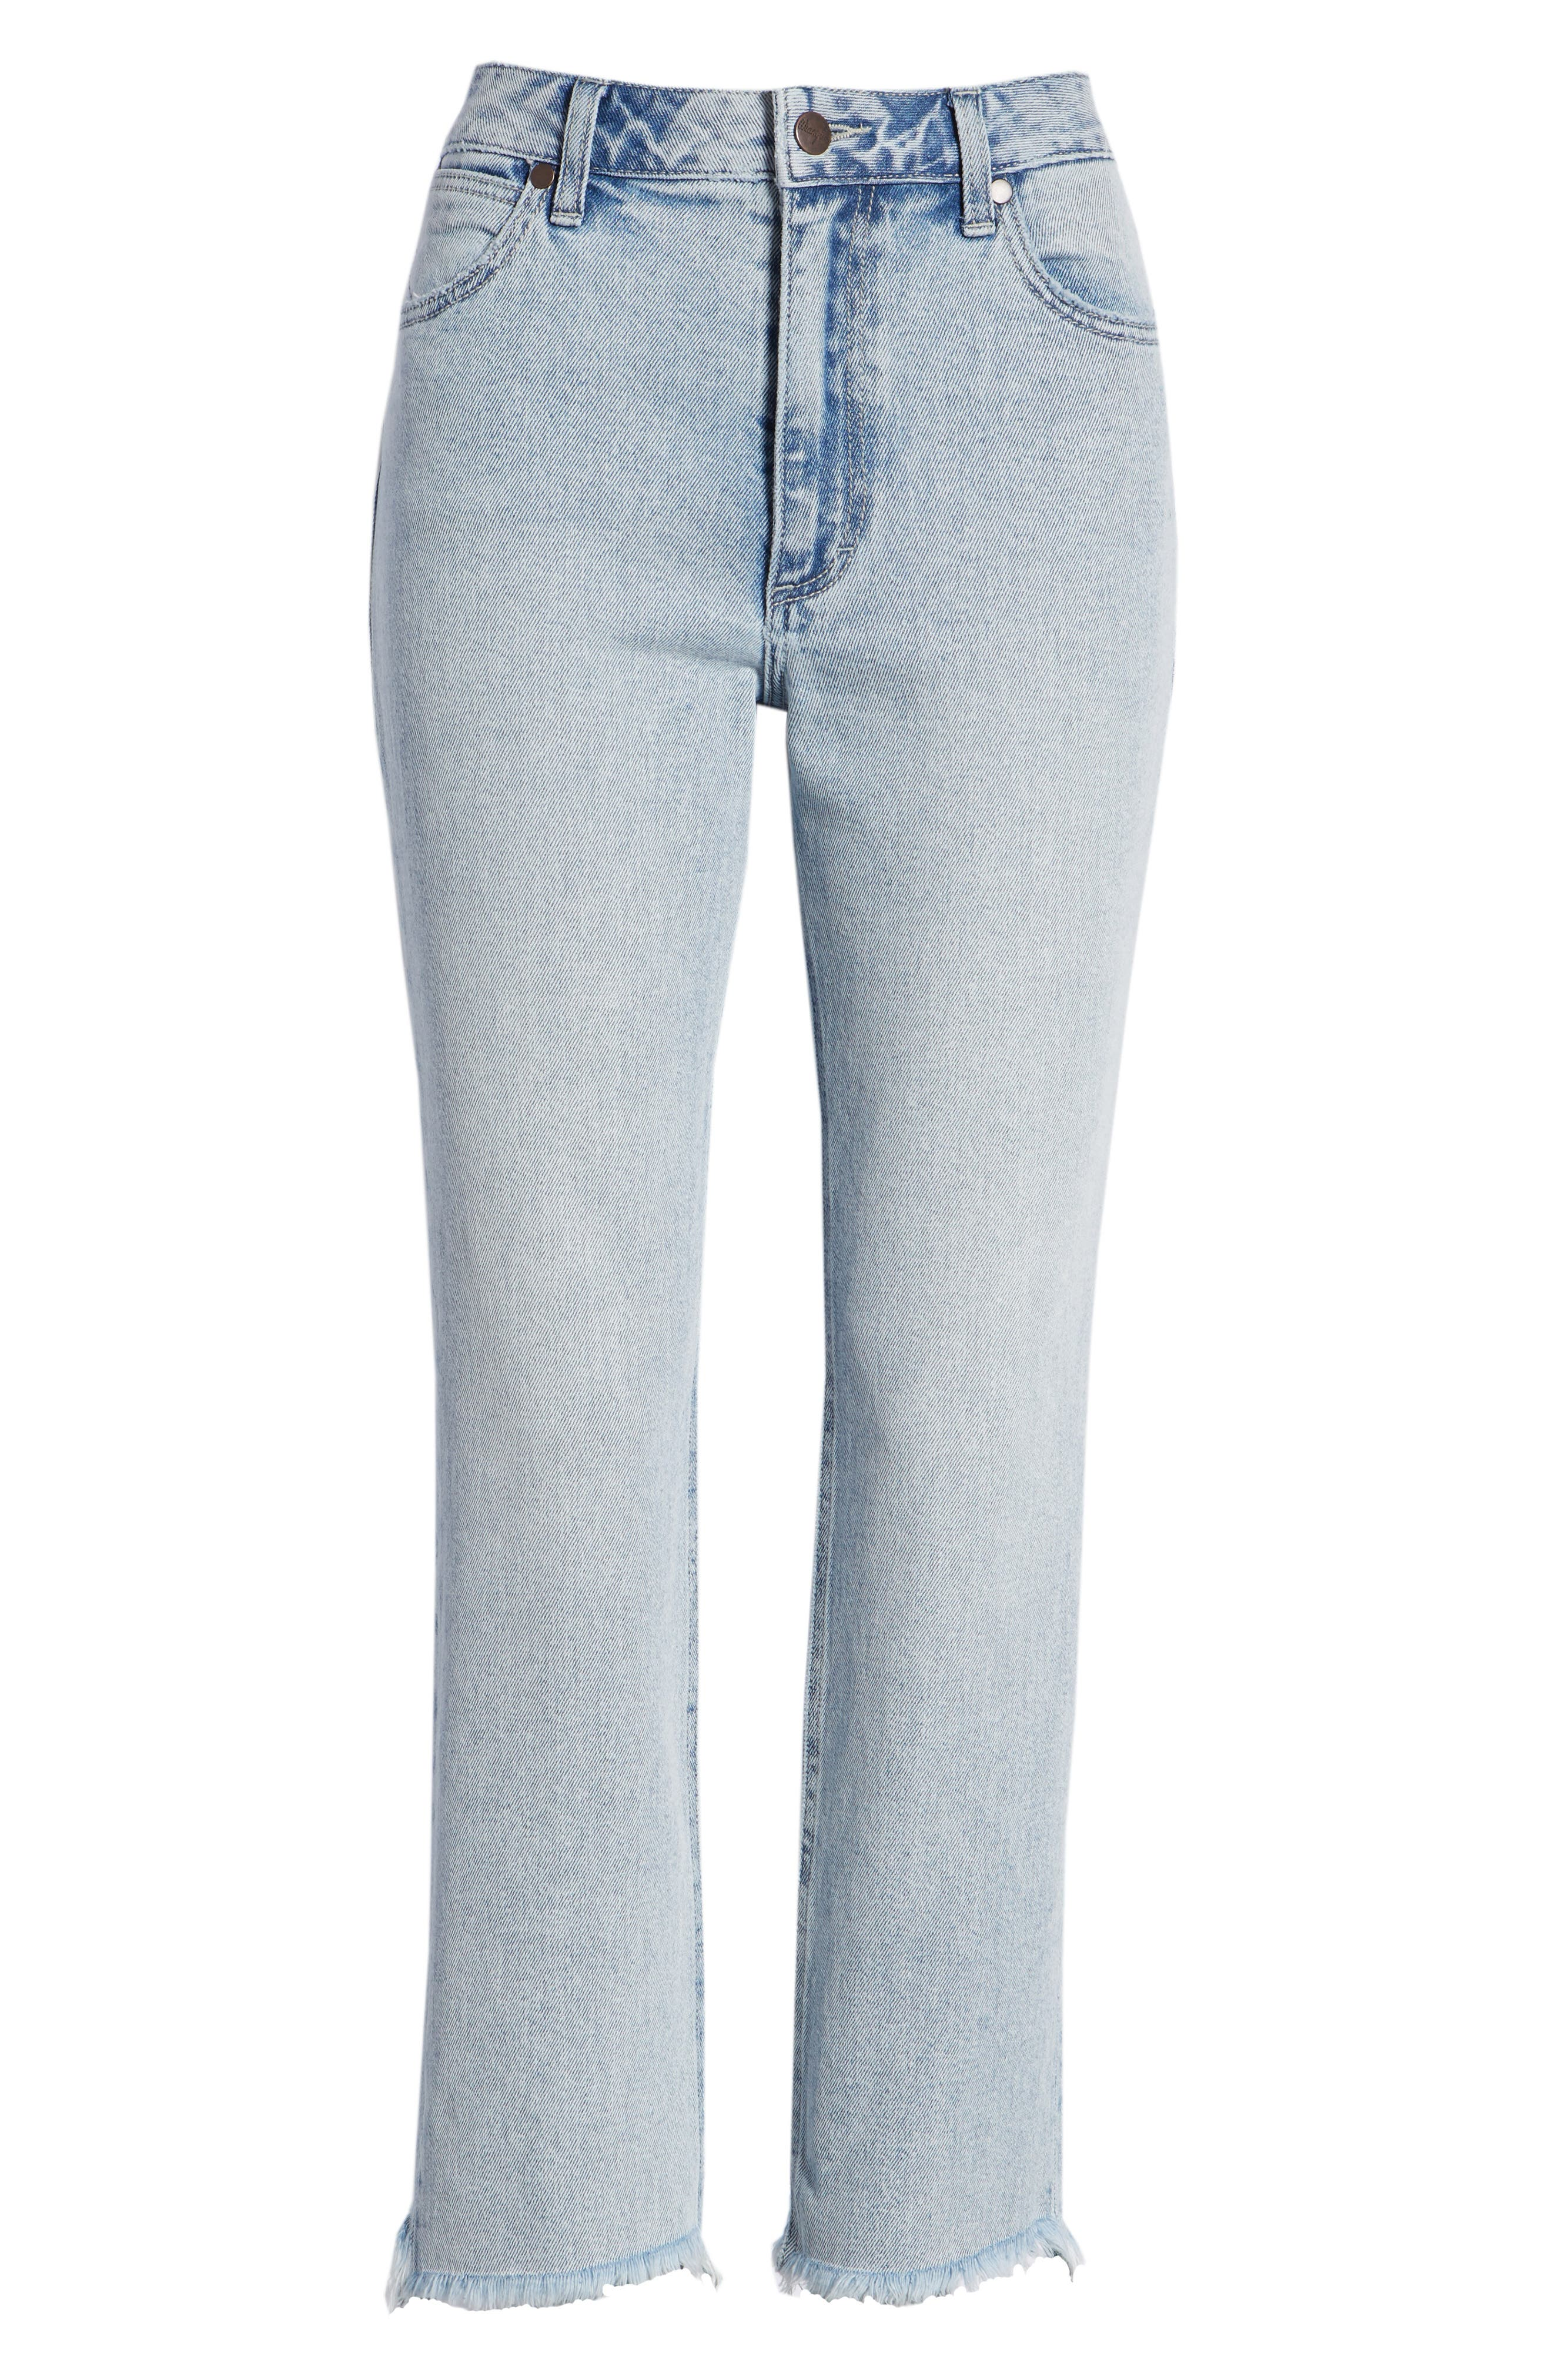 WRANGLER,                             Acid Wash High Waist Crop Jeans,                             Alternate thumbnail 7, color,                             454